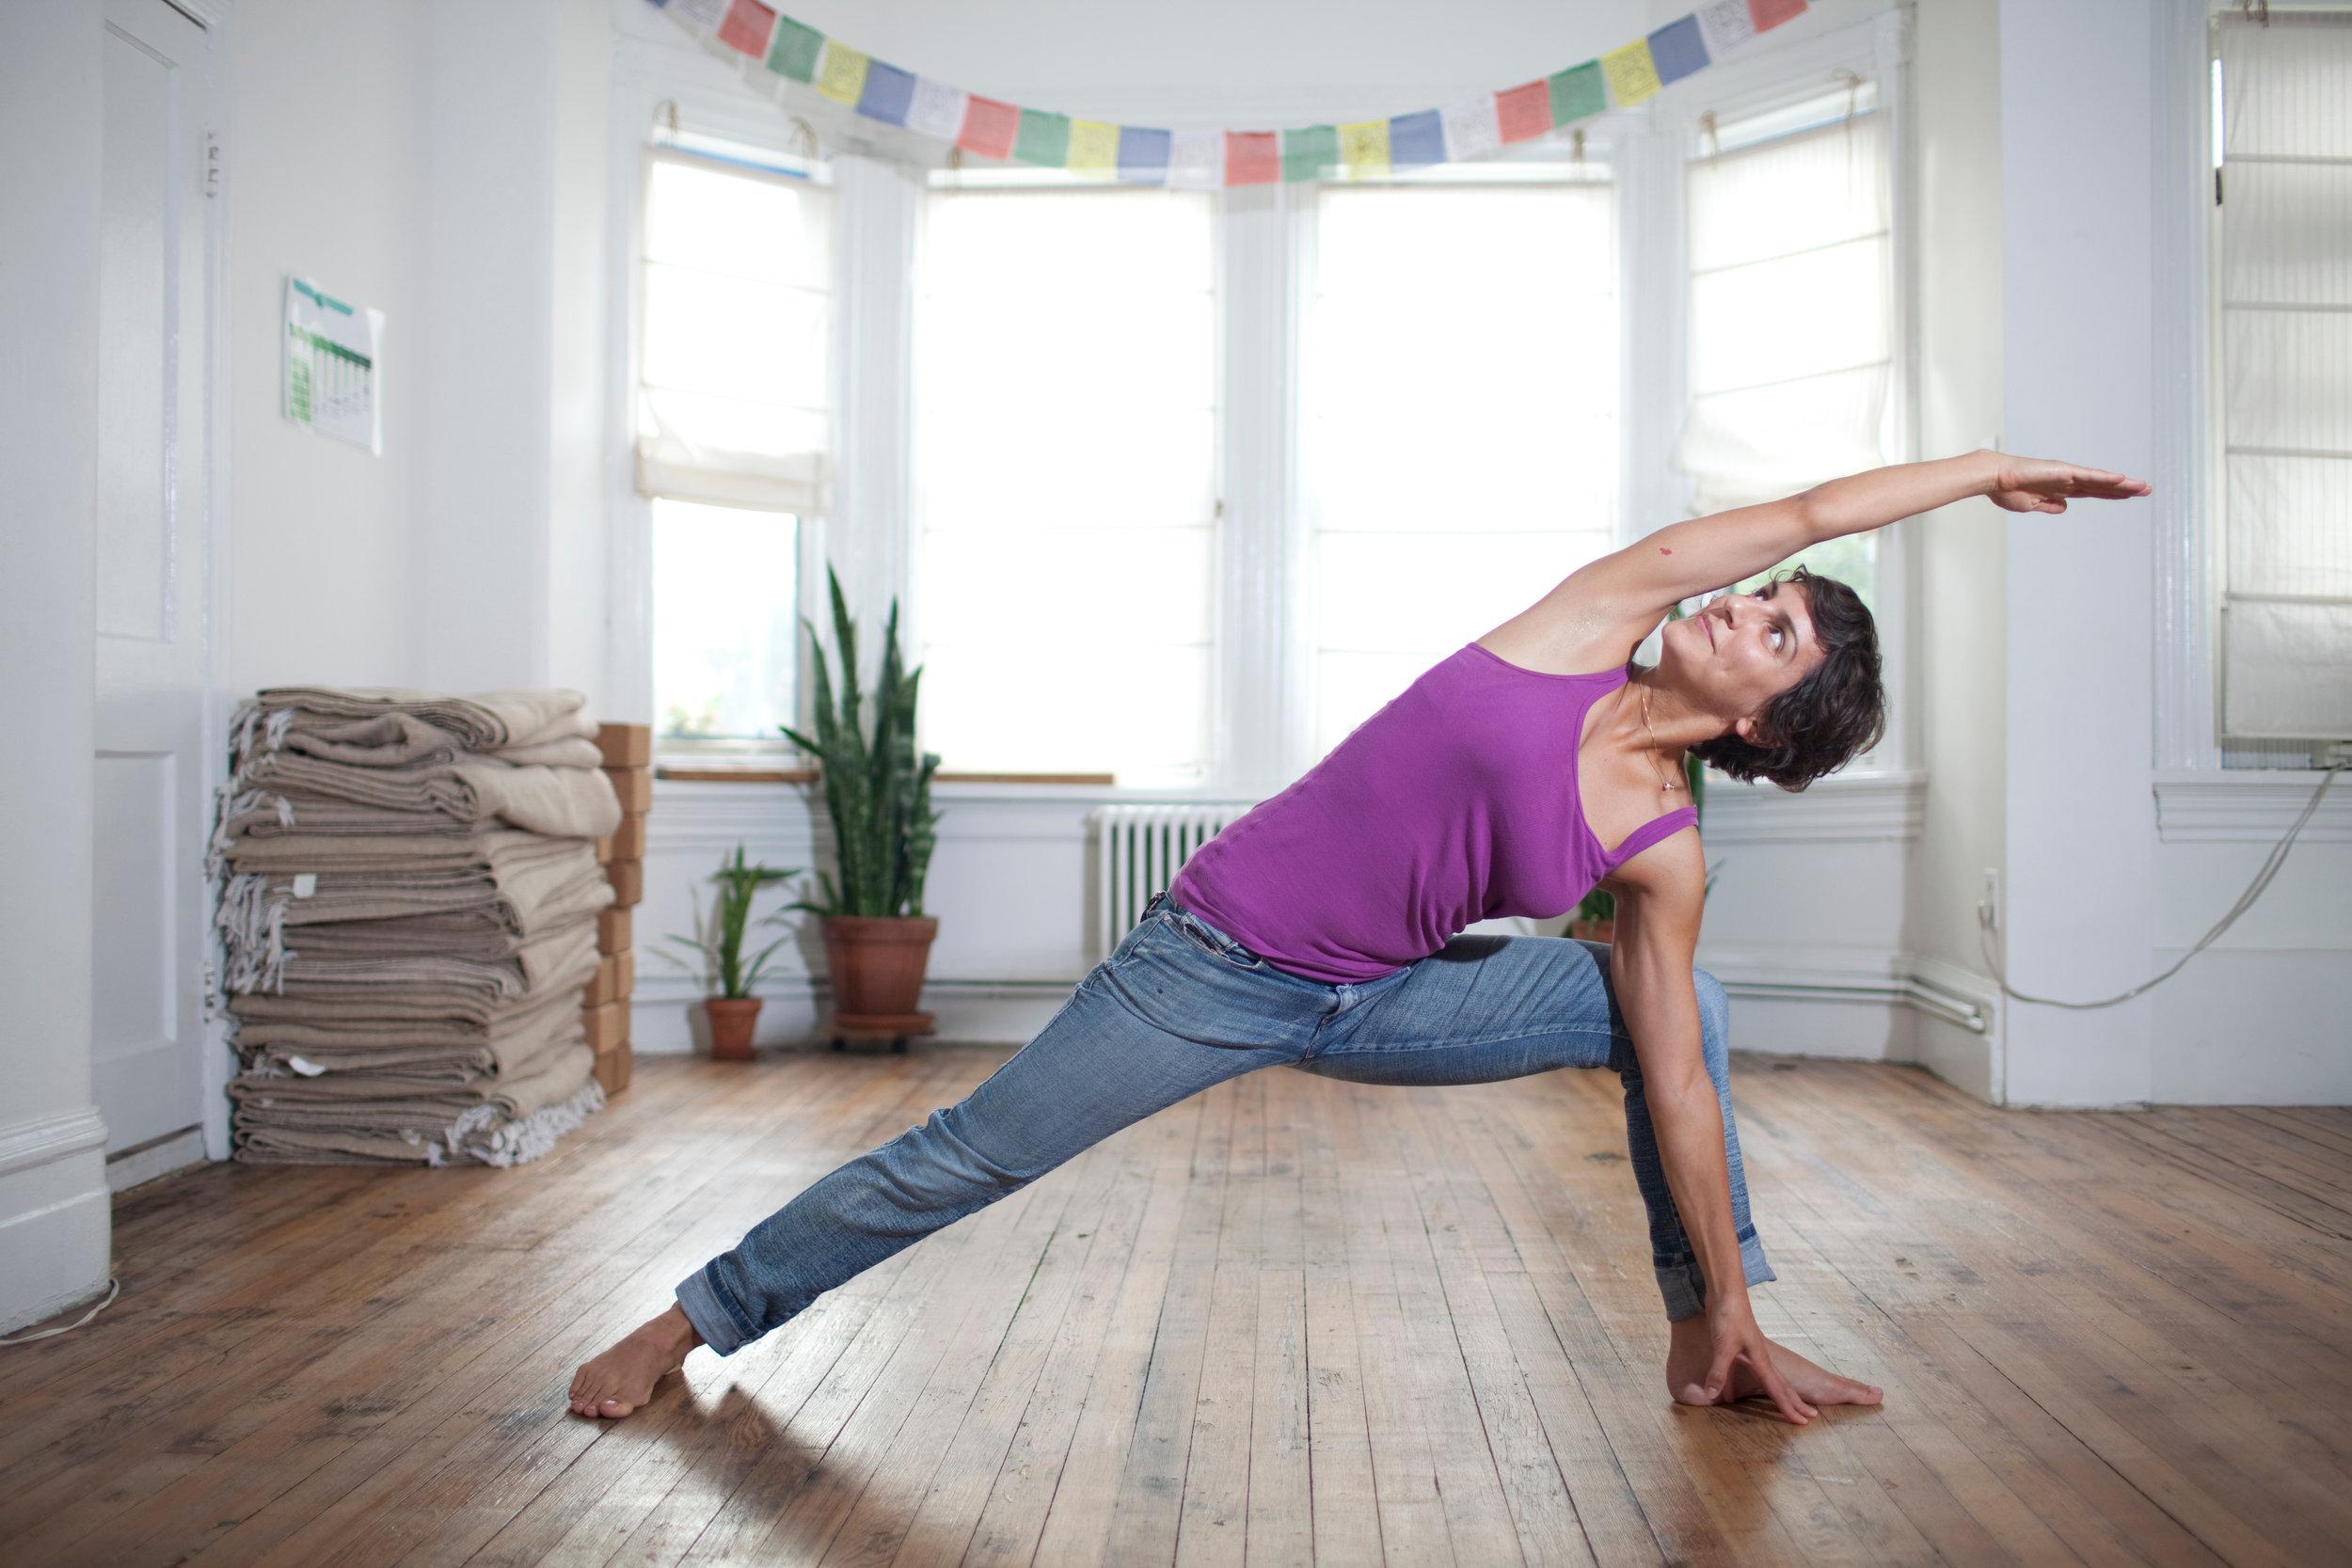 Yoga District founder Jasmine Chehrazi